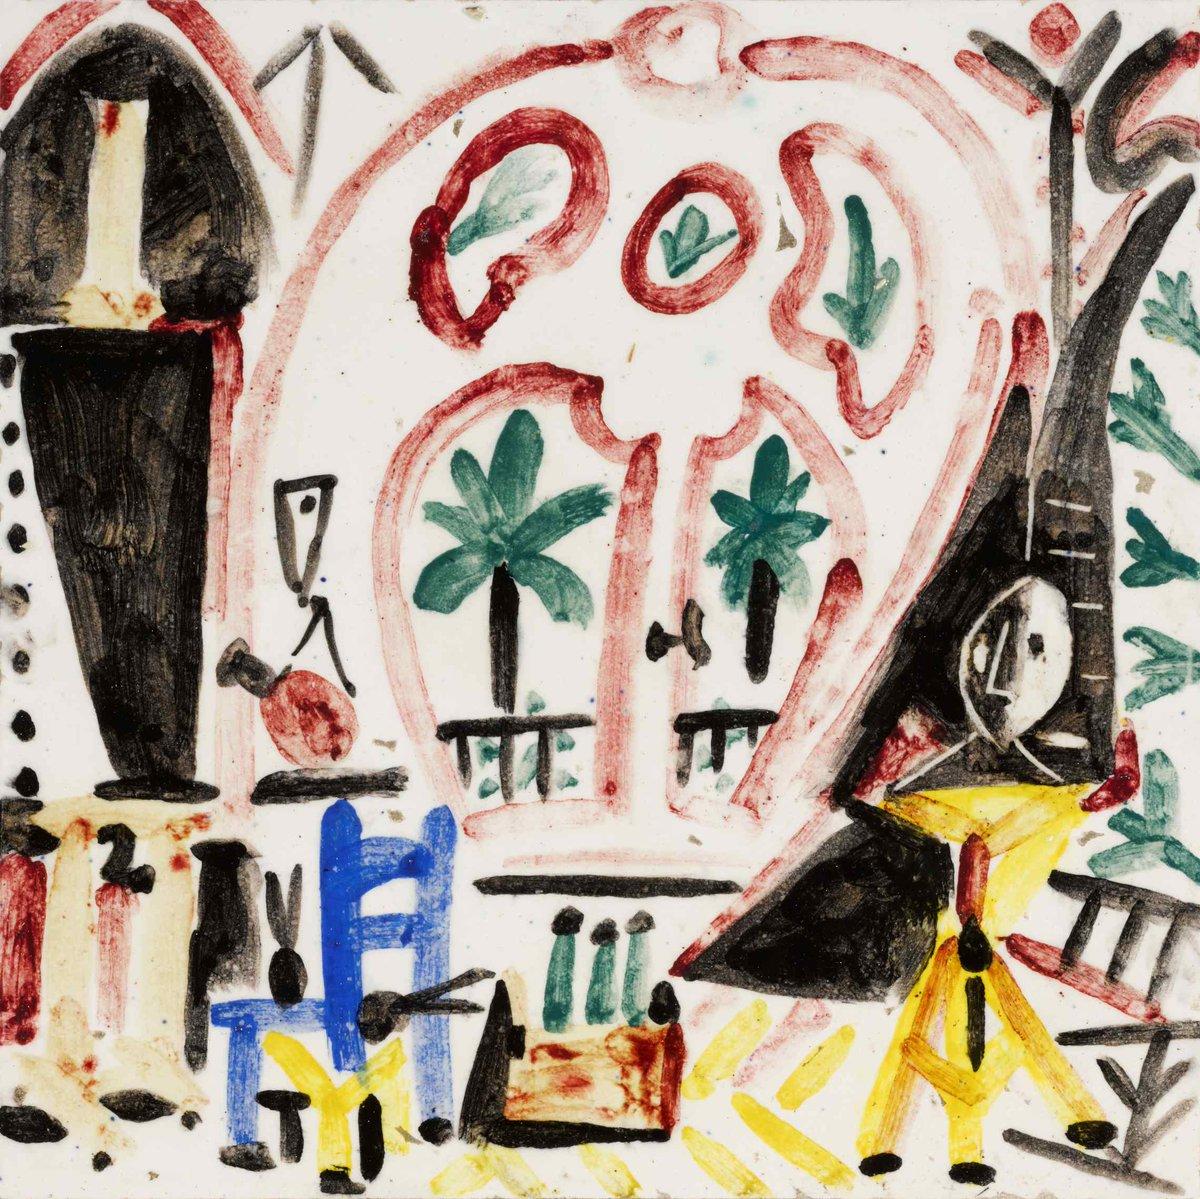 #AuctionUpdate Kicking off tonight's sale, bidders chase La Fenêtre de l'atelier La Californie, a unique ceramic title from 1956, to achieve $214,200. Picasso's La Californie residence featured Art Nouveau interiors that inspired a rich aesthetic in his work #SothebysxMGM